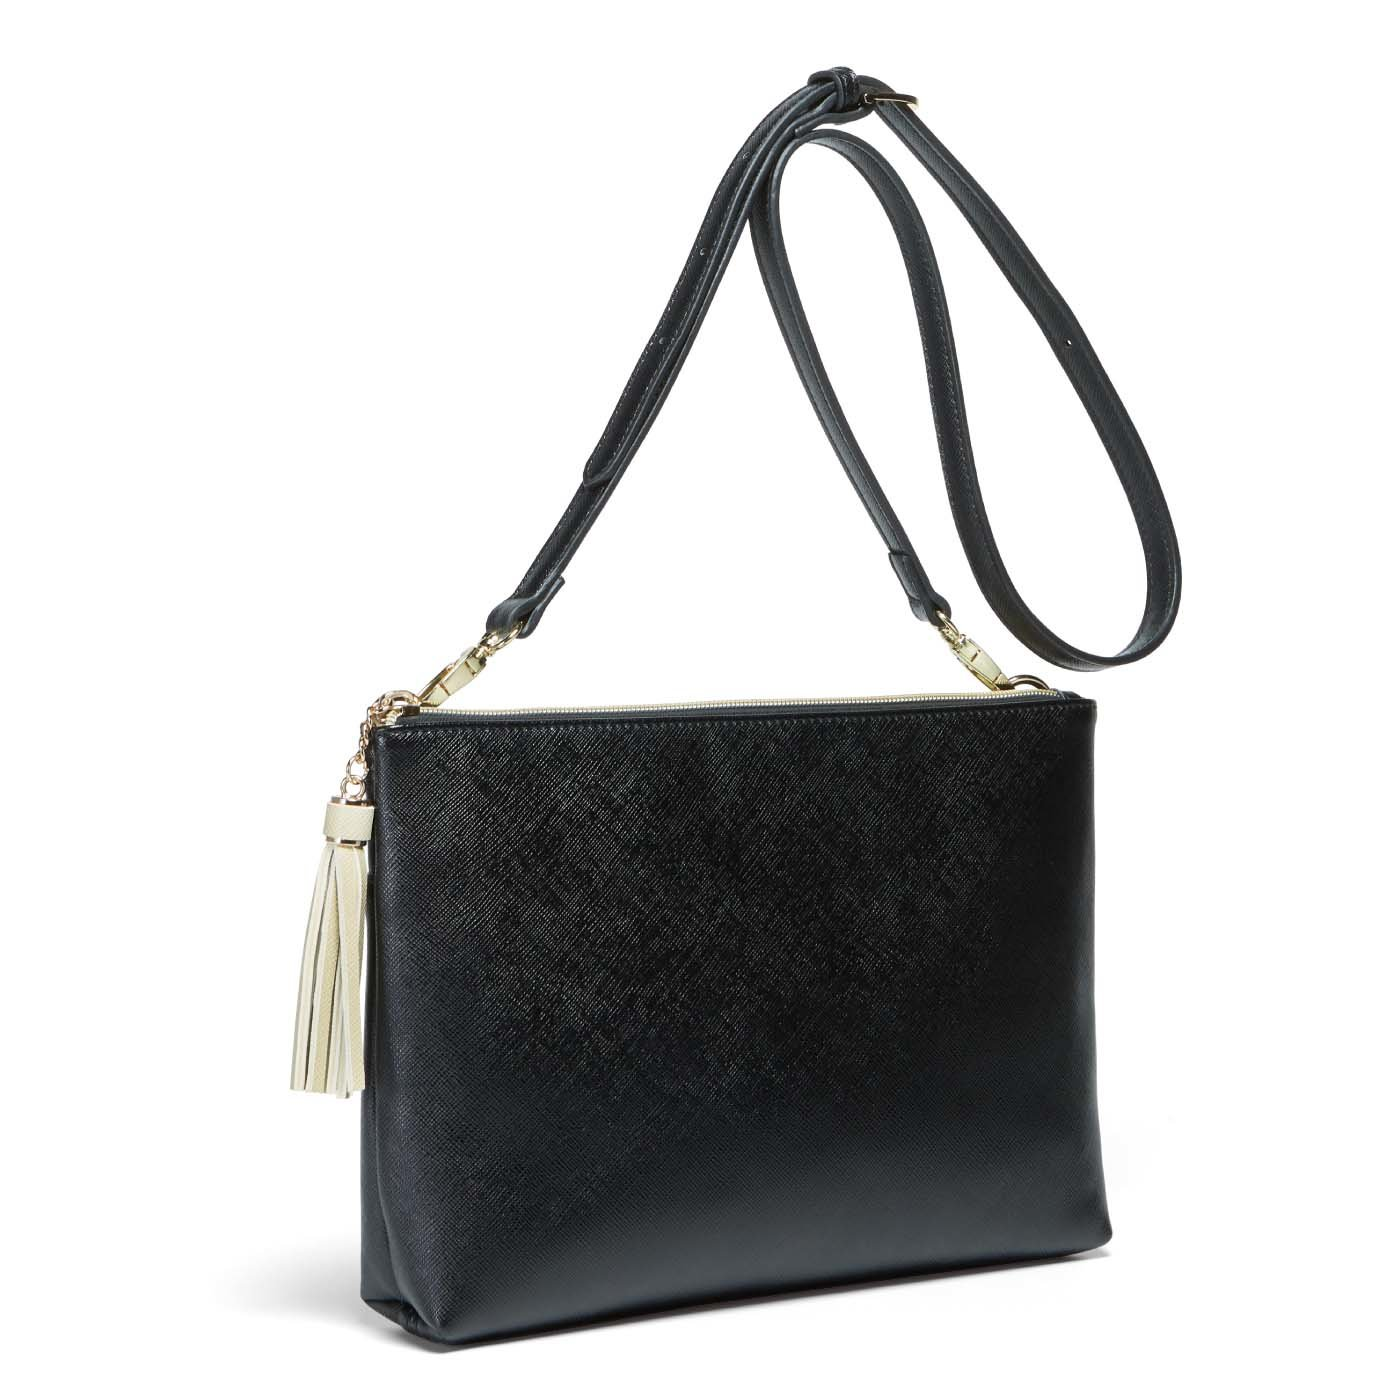 IEDIT[イディット] 街歩きにピッタリな大人好みのきれいめトラベルバッグセット〈ブラック〉